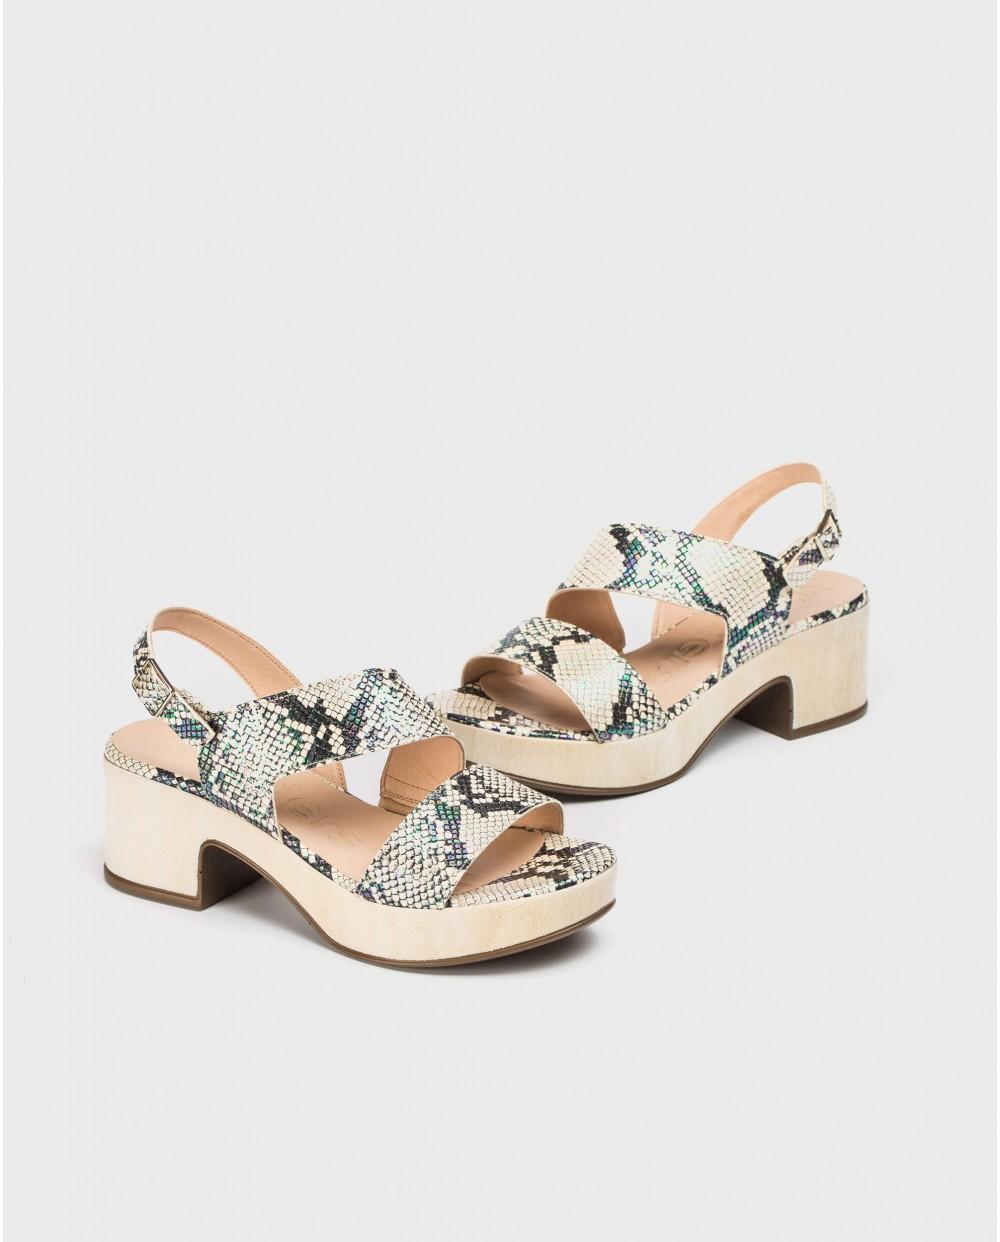 Double strap Sandal